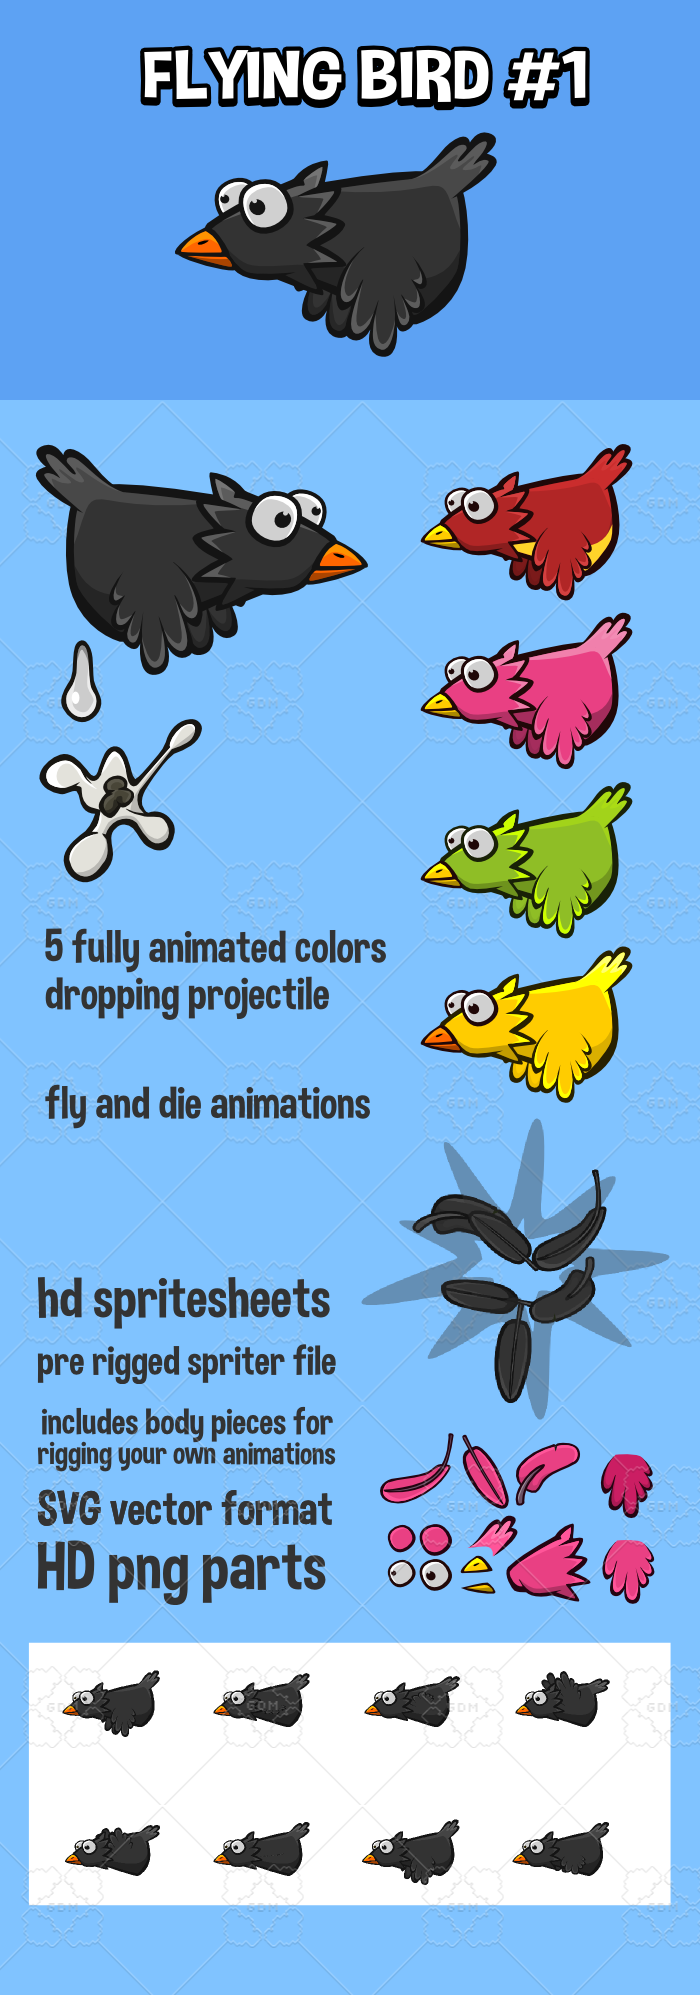 Animated flying bird